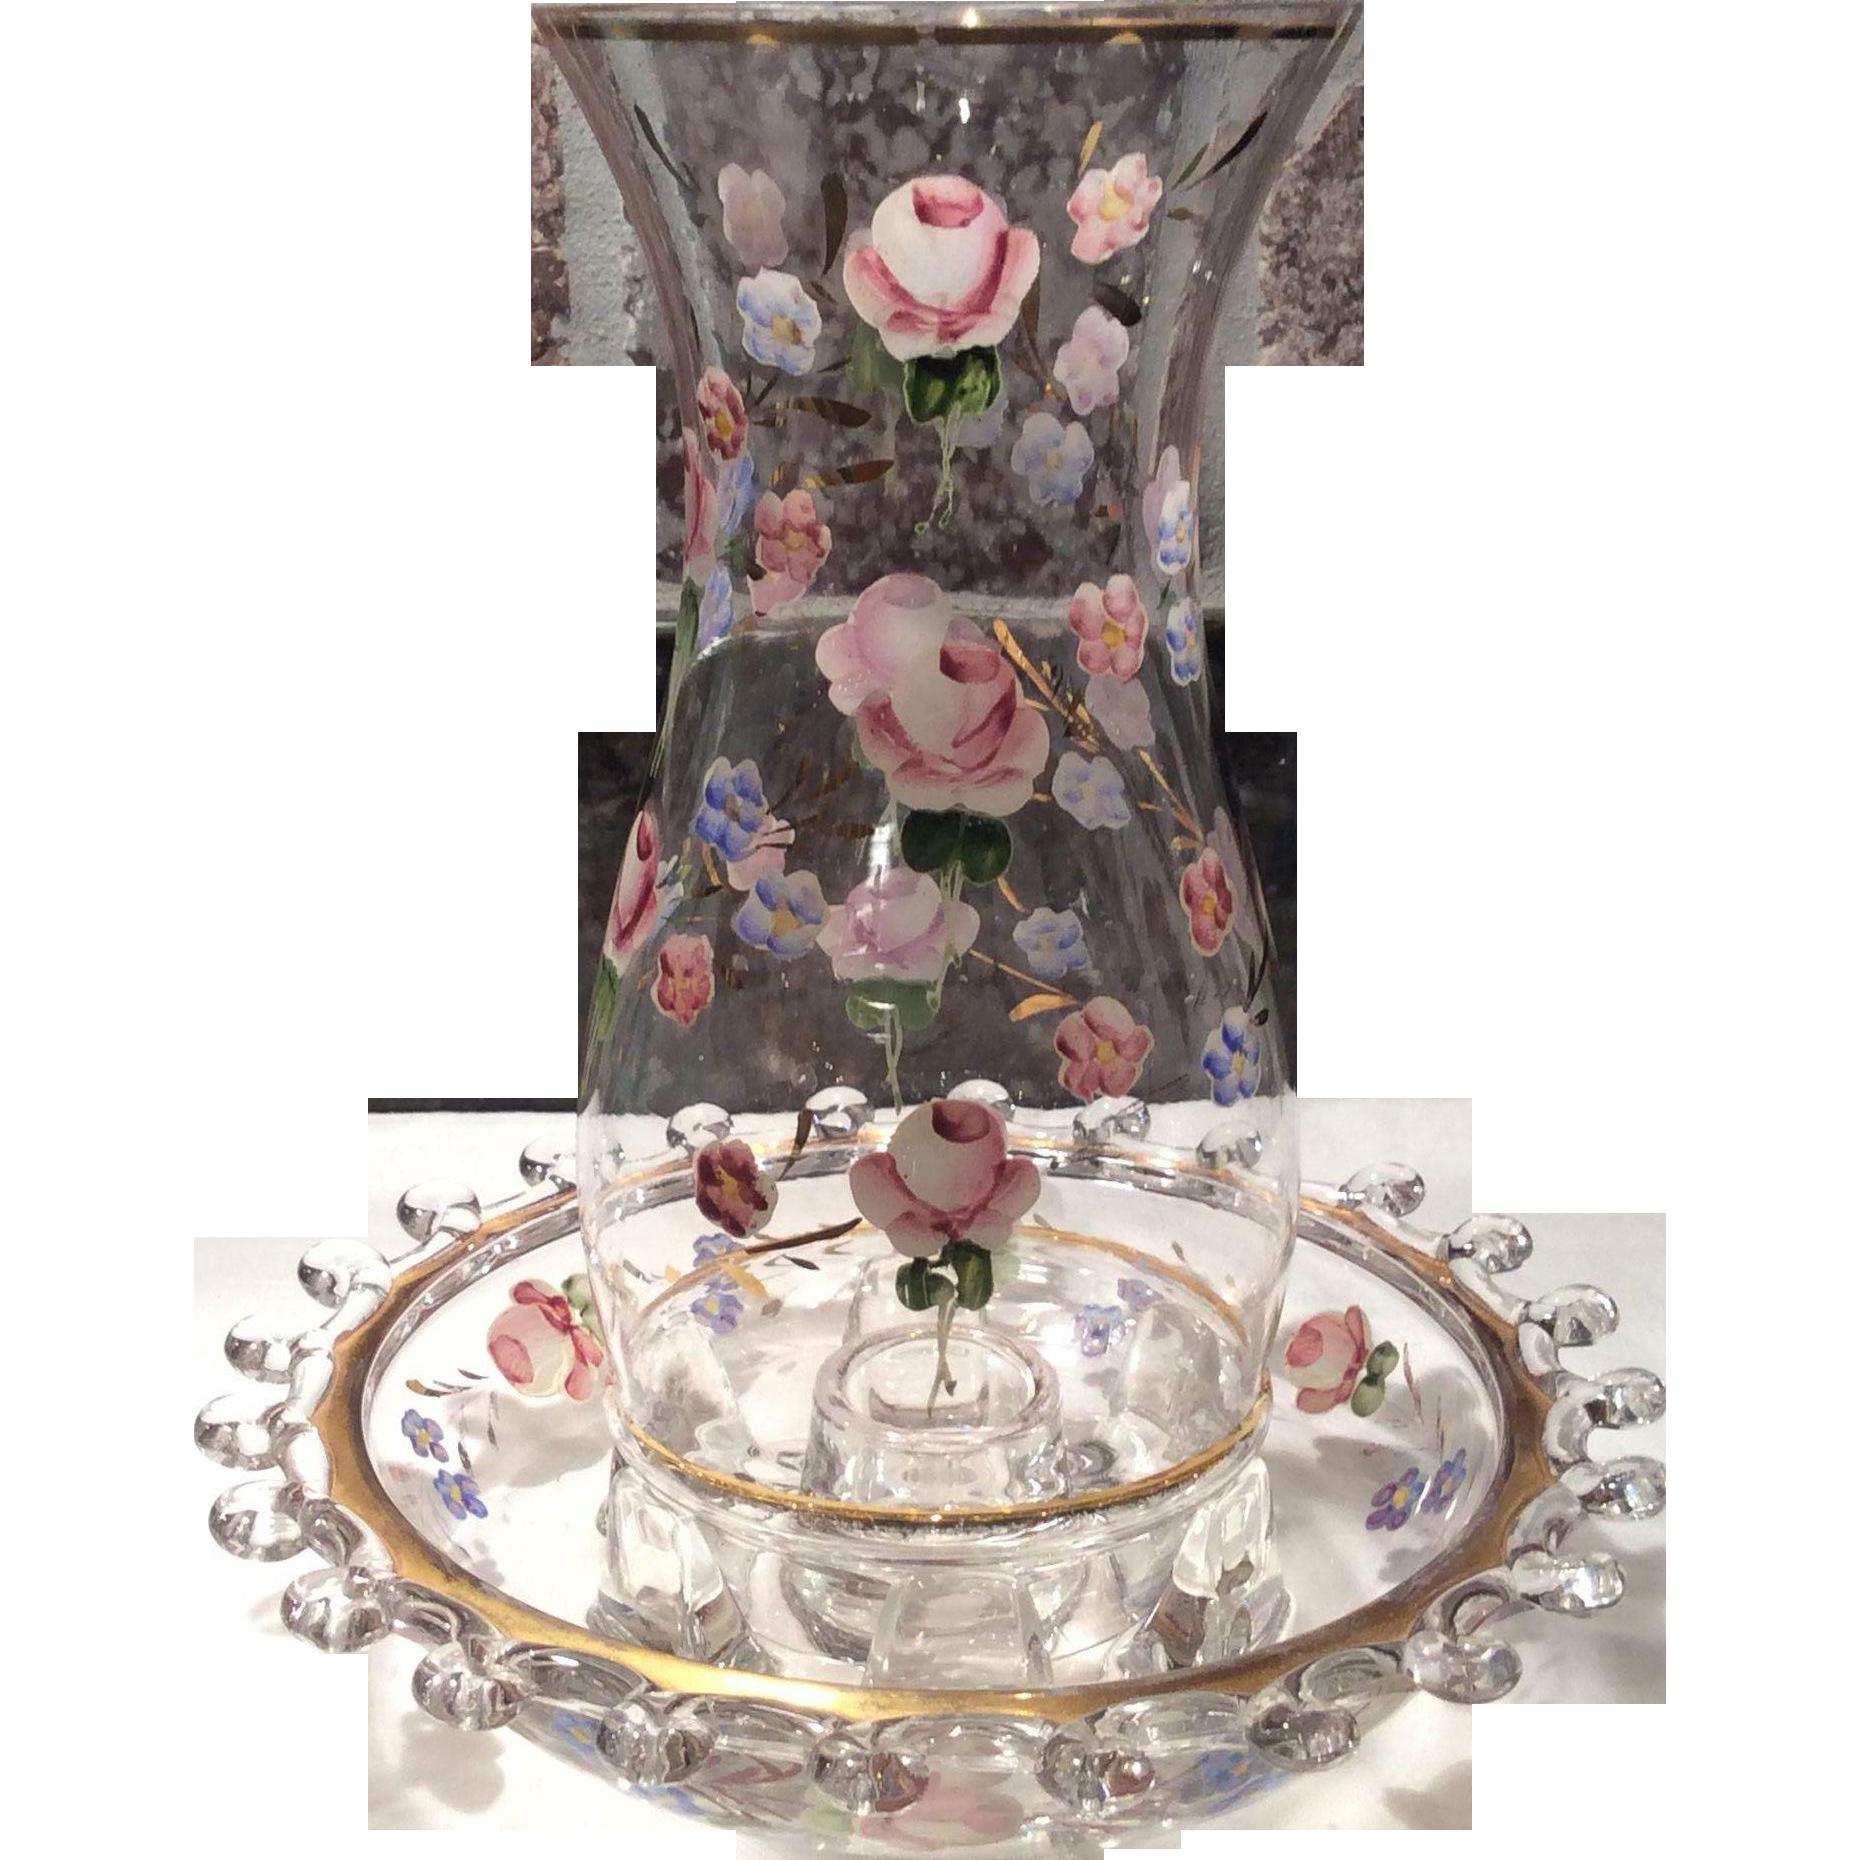 "Heisey Crystal Lariat Pattern #1540 - 8"" Hurricane Shade & Base with Charleton Roses Decoration"